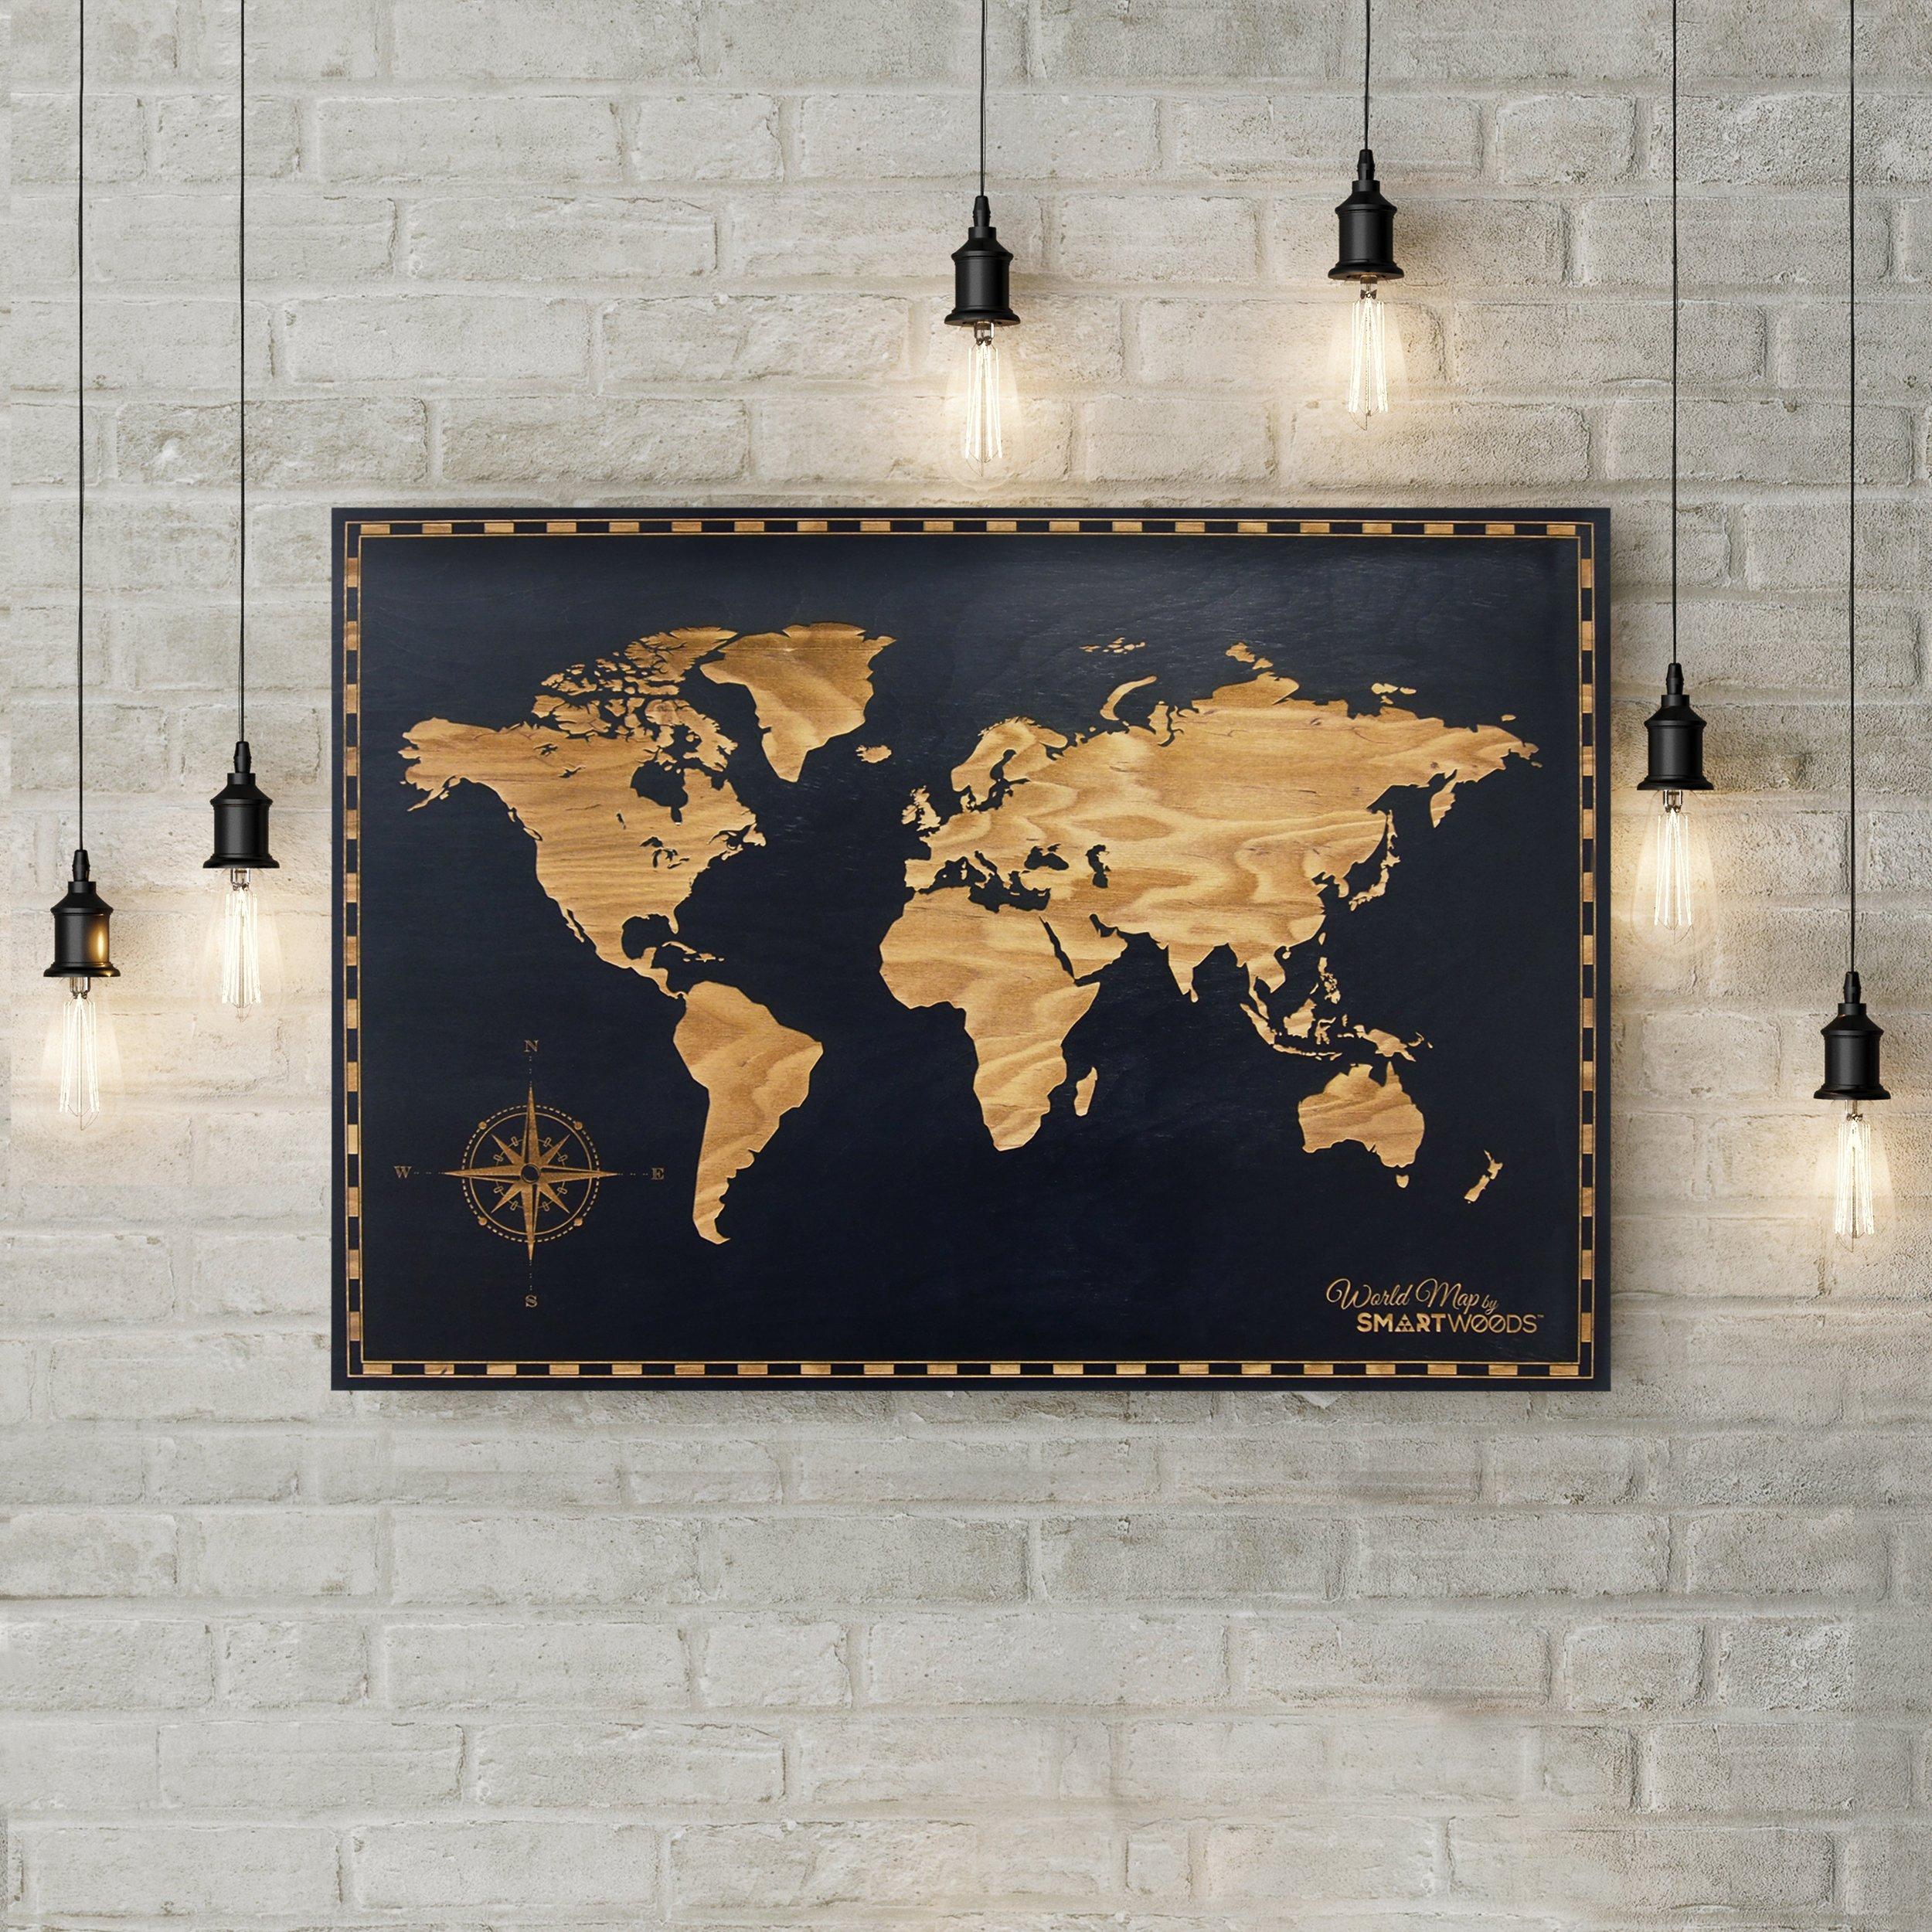 SmartWoods Black World Map, Image. 85 x 59 cm, 120 cm x 60cm, 120cm x 90 cm, Wall Art, World map, Trendy Design, Interior Decoration, Handmade, World, 100% Wood, (85 x 59 cm) by SmartWoods